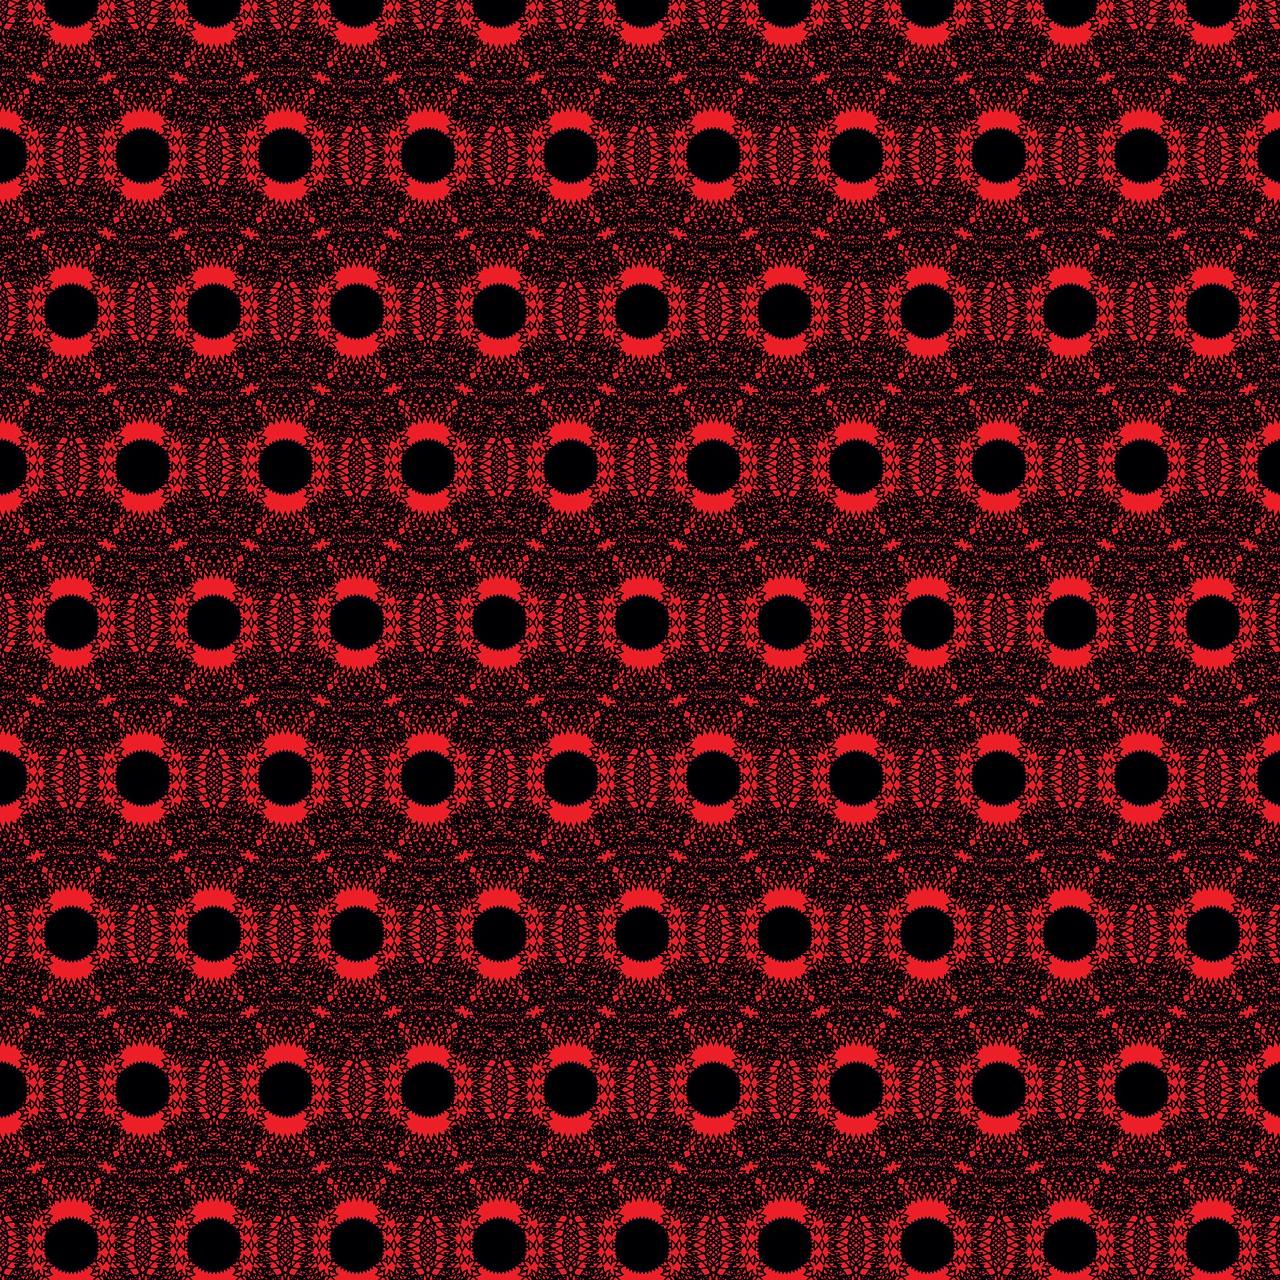 Background Red Black Free Image On Pixabay